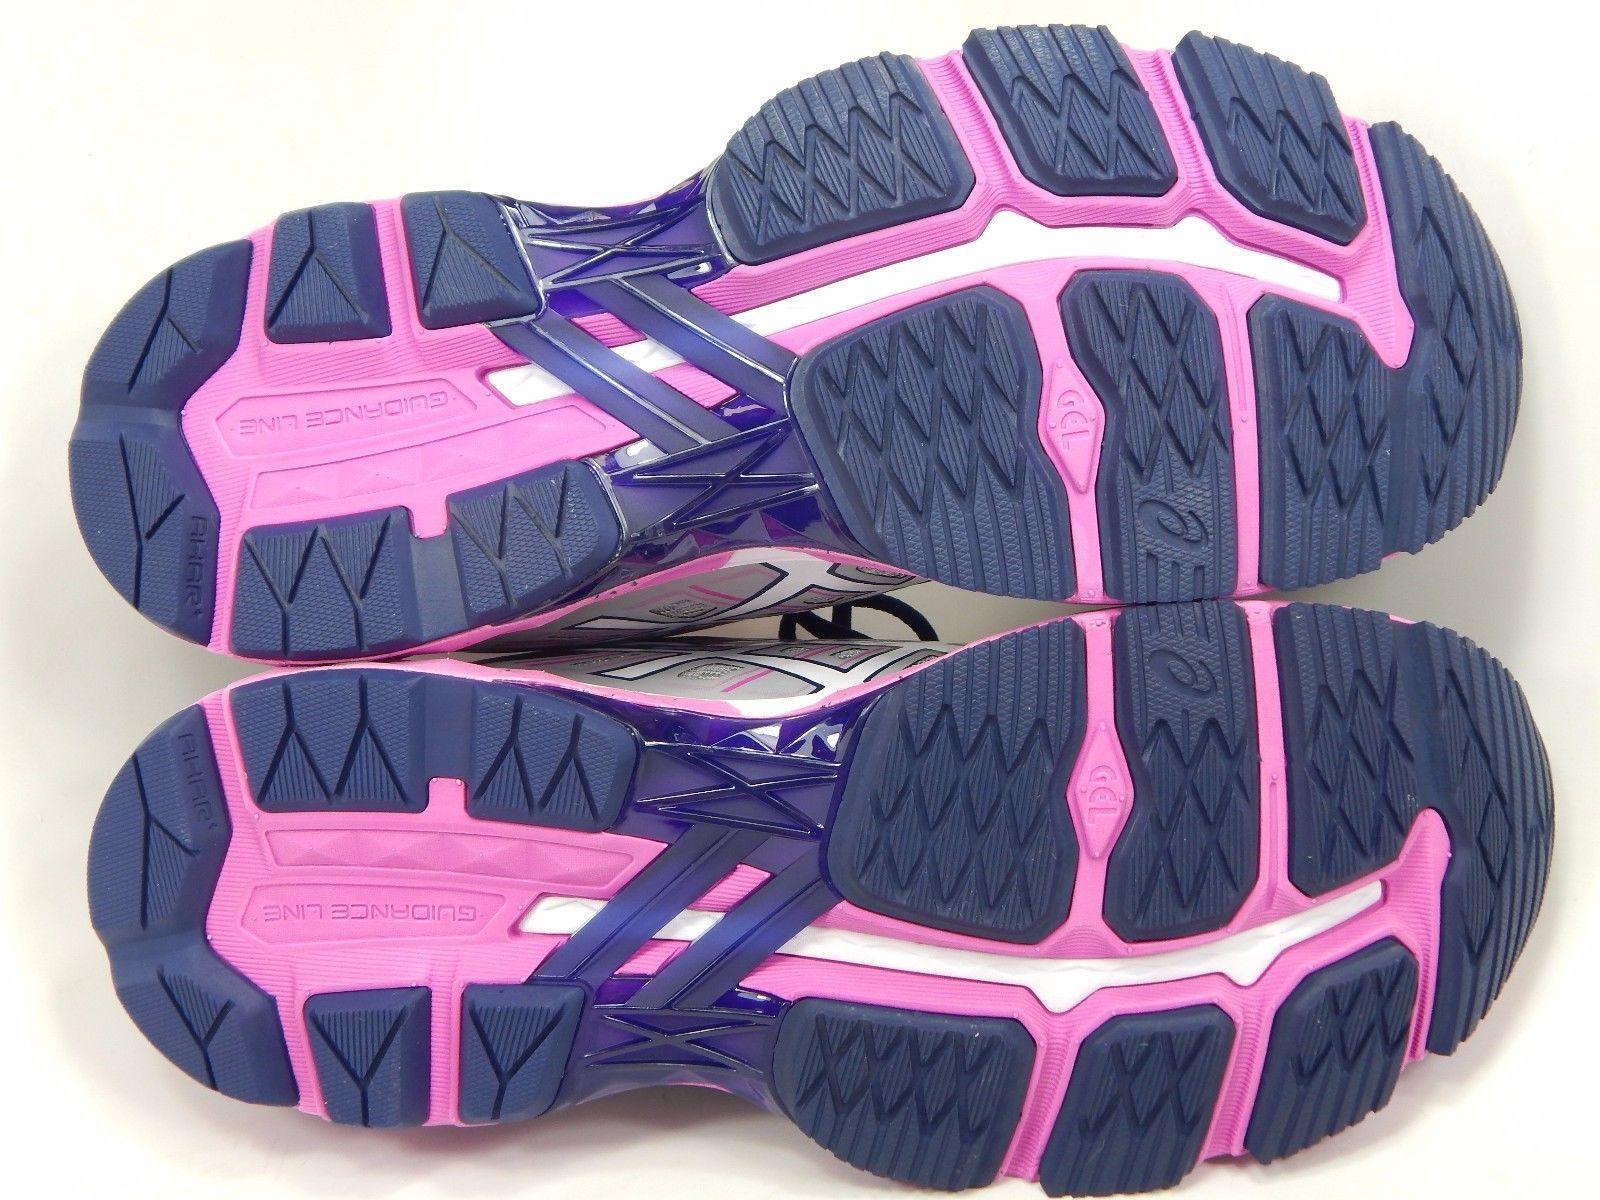 Asics GT 2000 v 5 Women's Running Shoes Size US 9 2A NARROW EU 40.5 T760N Silver